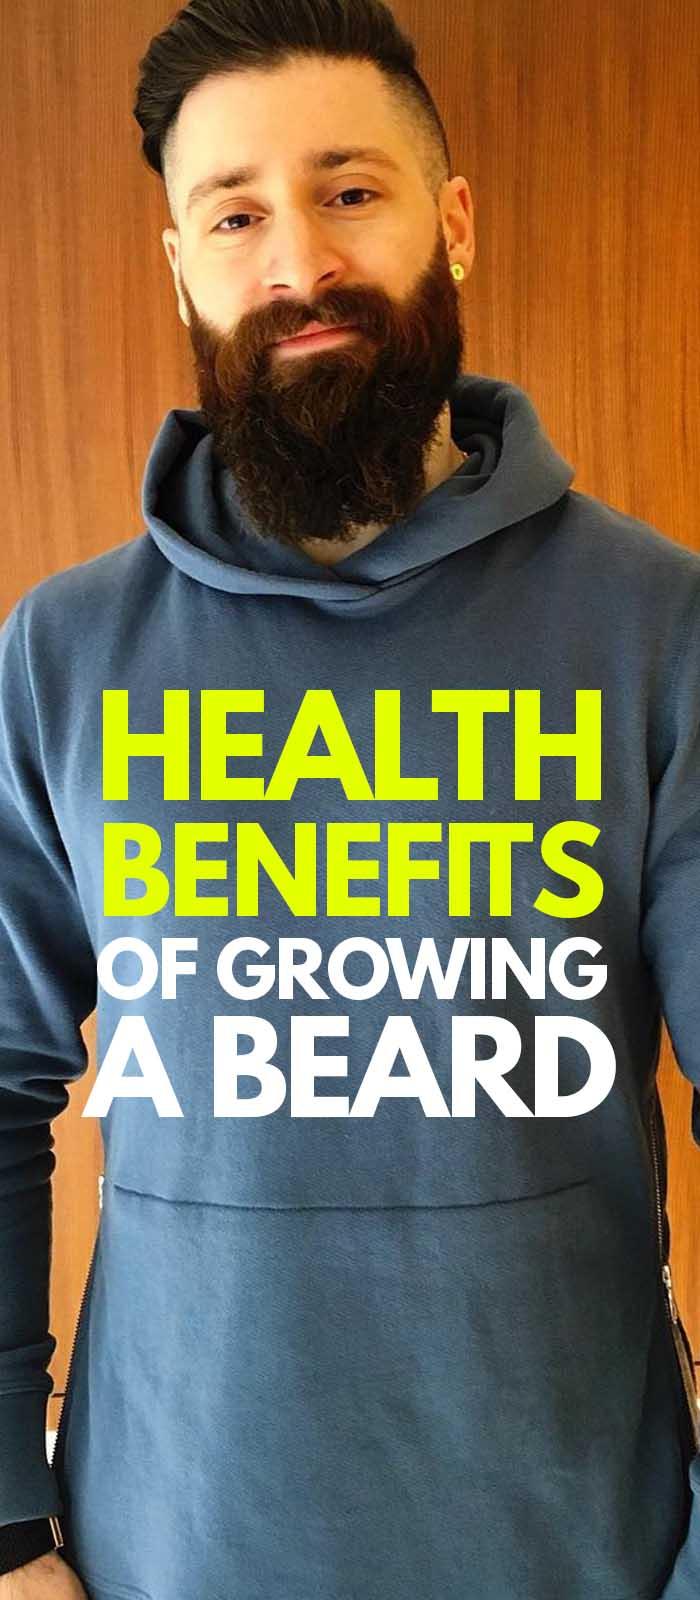 Benefits Of Growing A Beard.